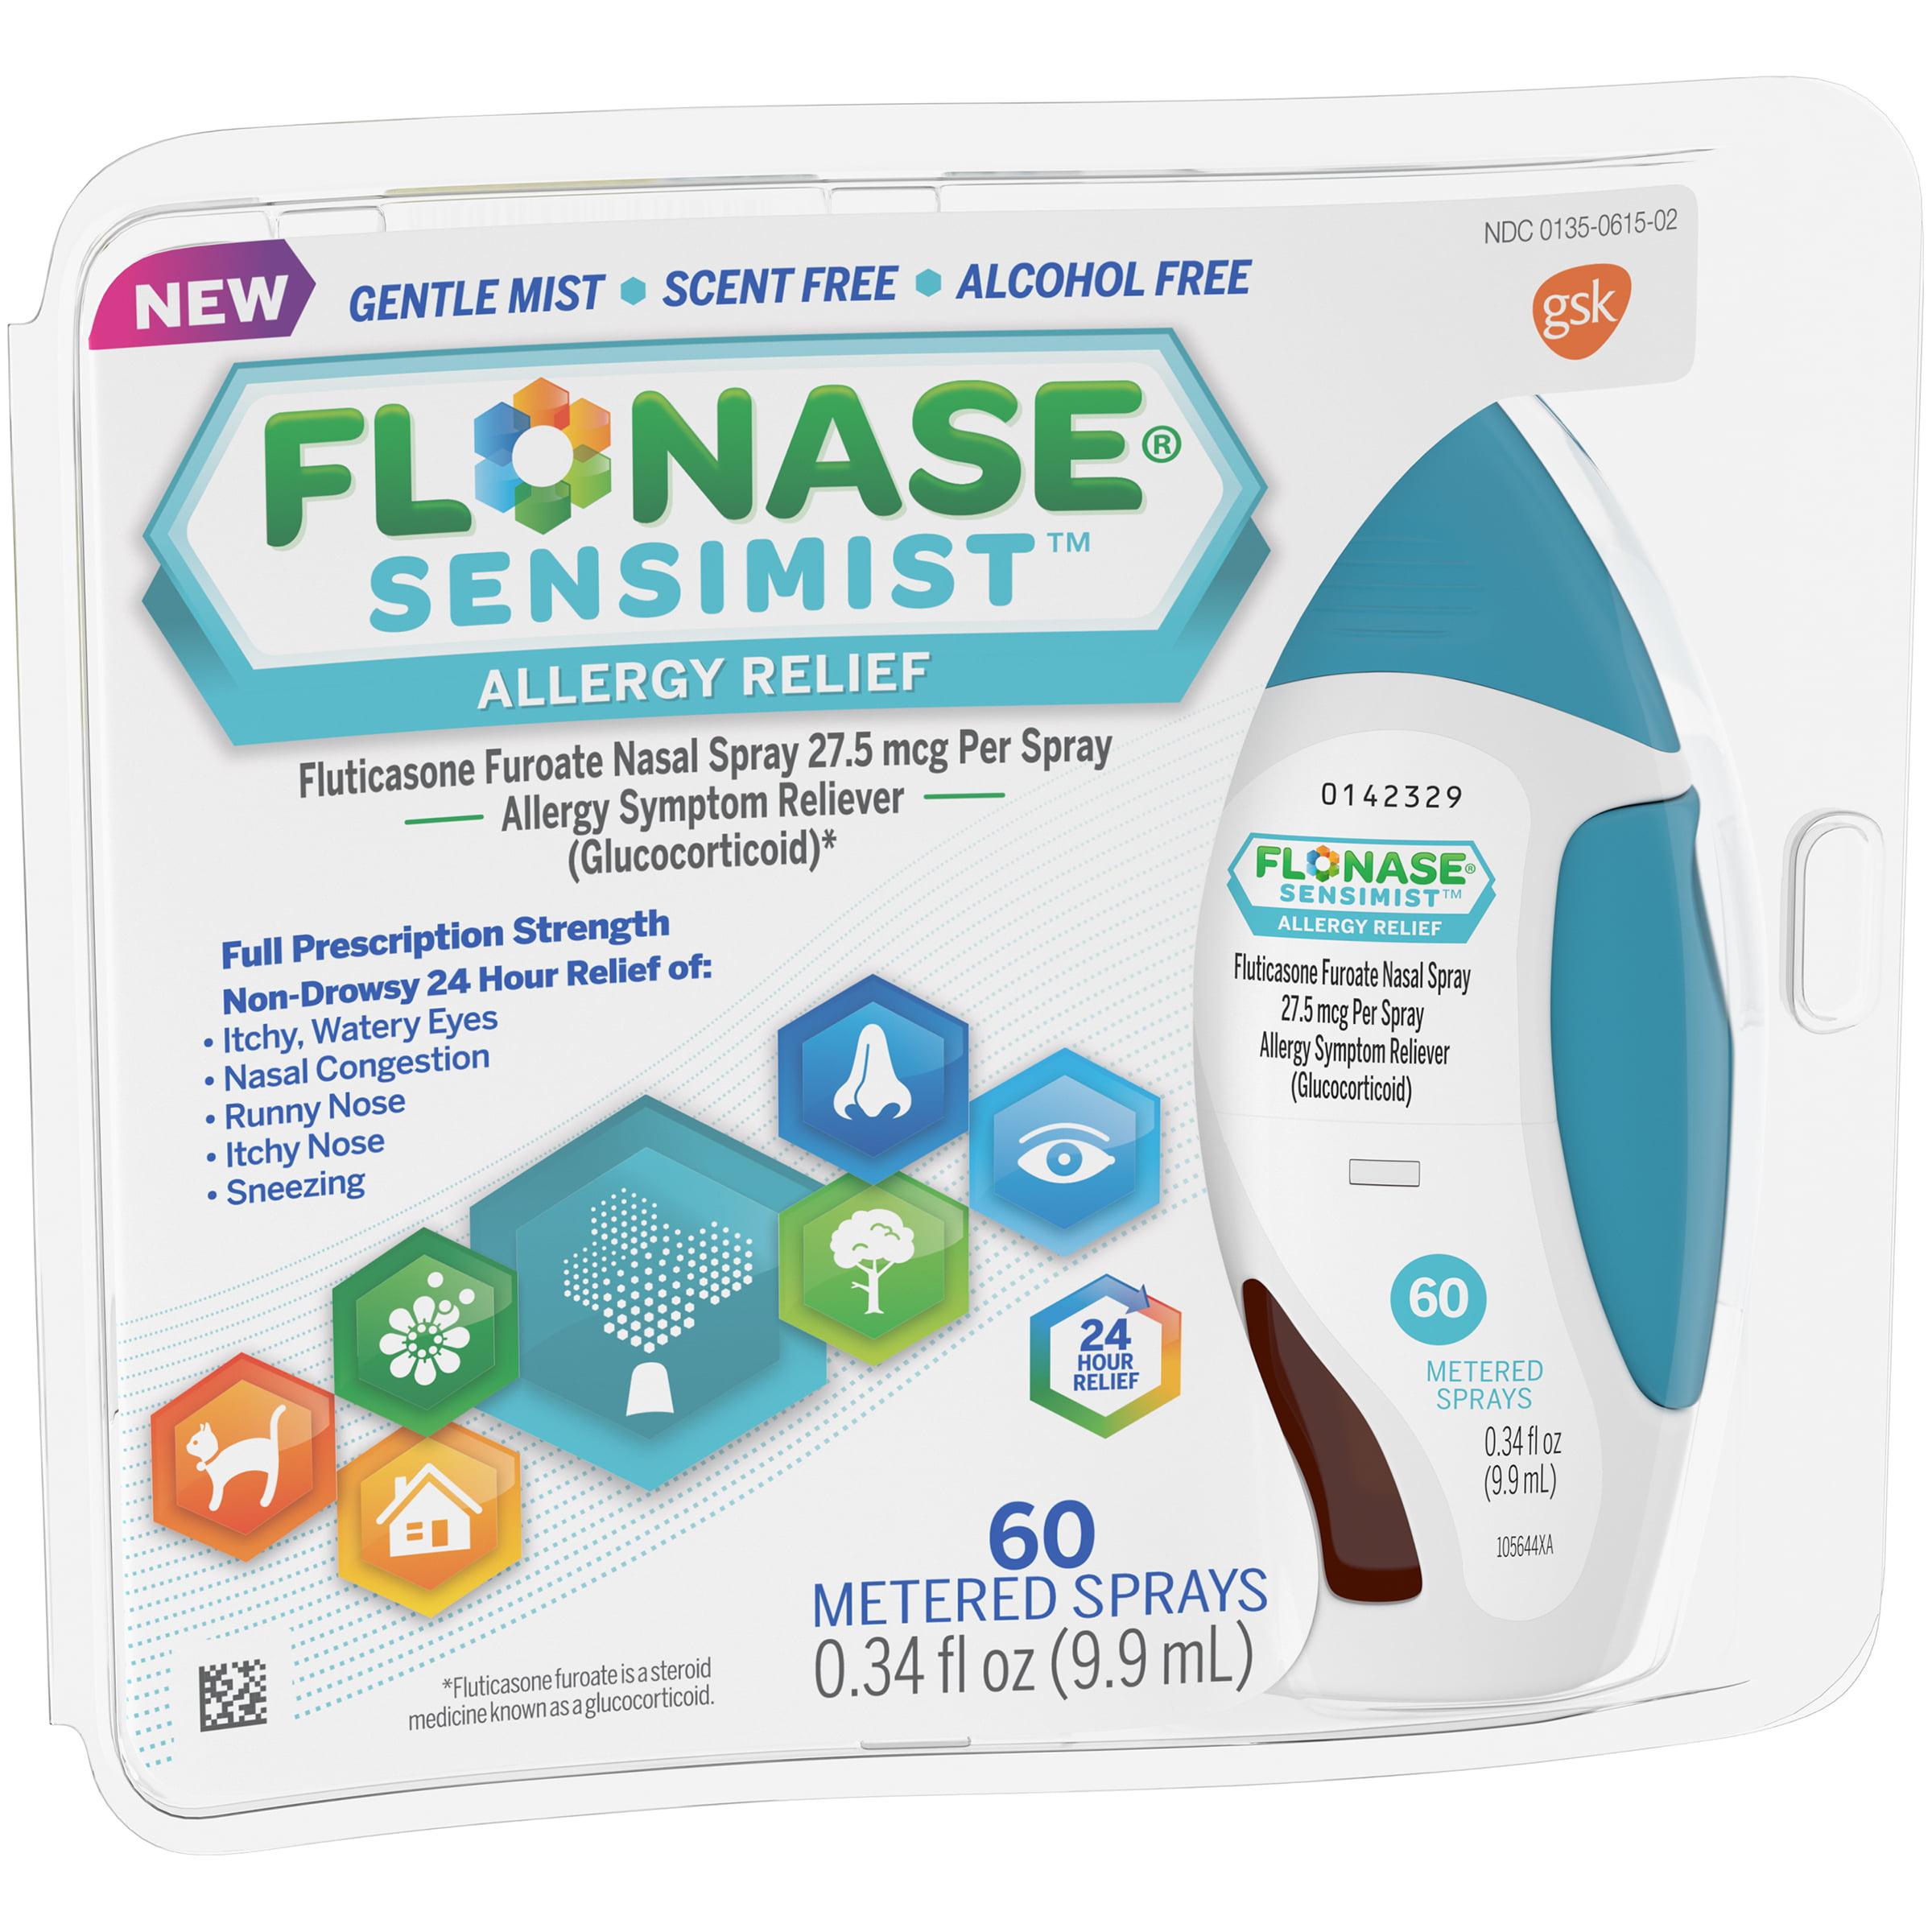 Flonase Sensimist Allergy Relief Spray, 60 Metered Sprays, 0.34 fl. oz.